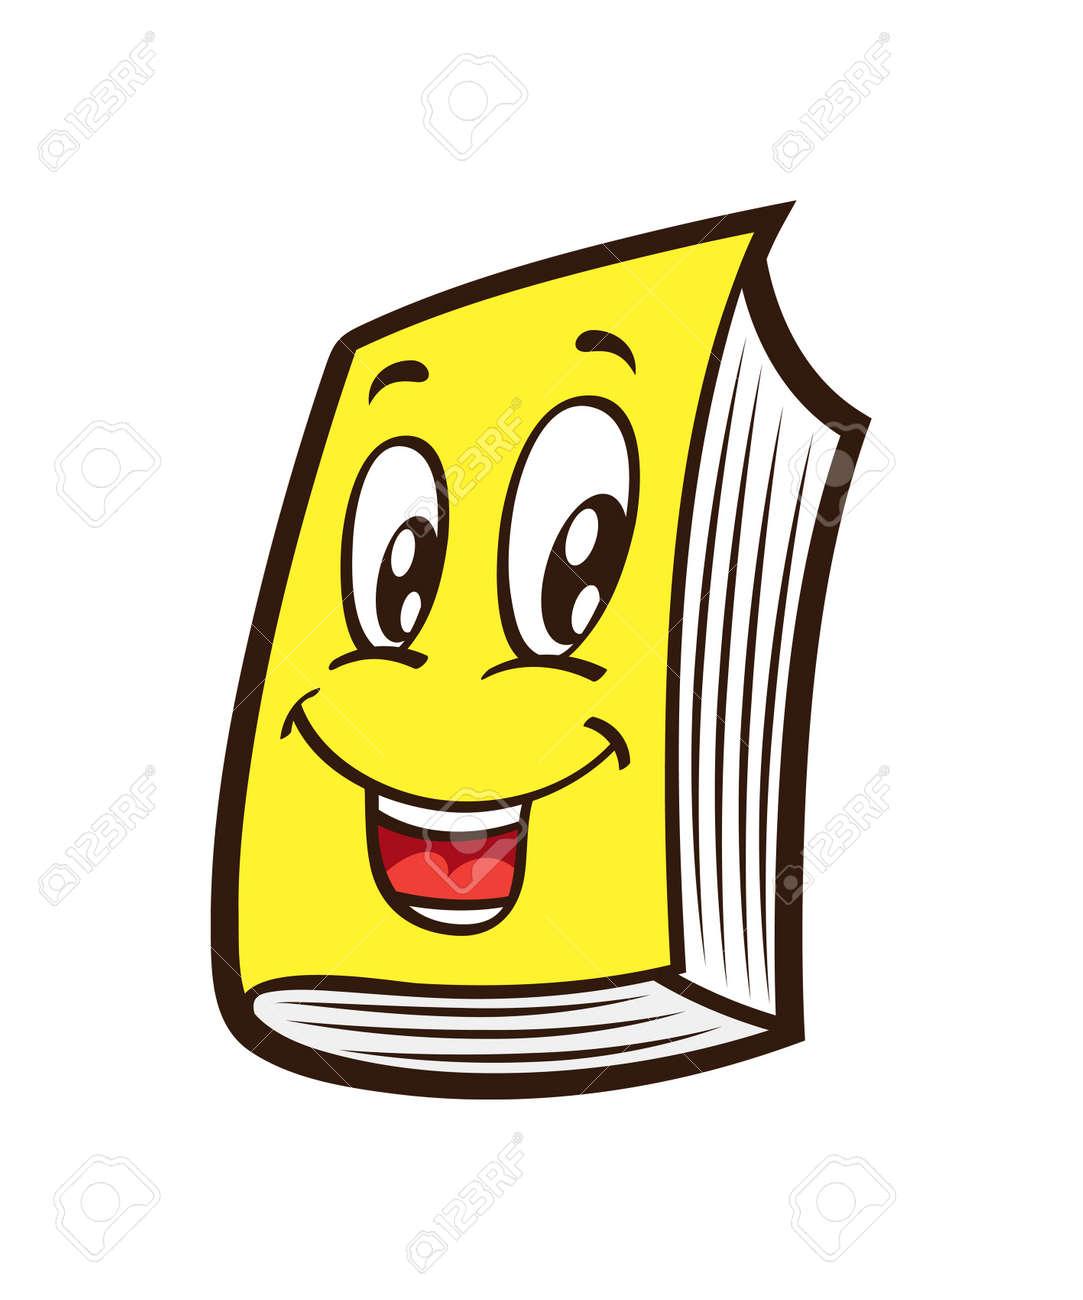 cartoon book royalty free cliparts vectors and stock illustration rh 123rf com Sarcastic Smiley Face Clip Art Flower Smiley Face Clip Art